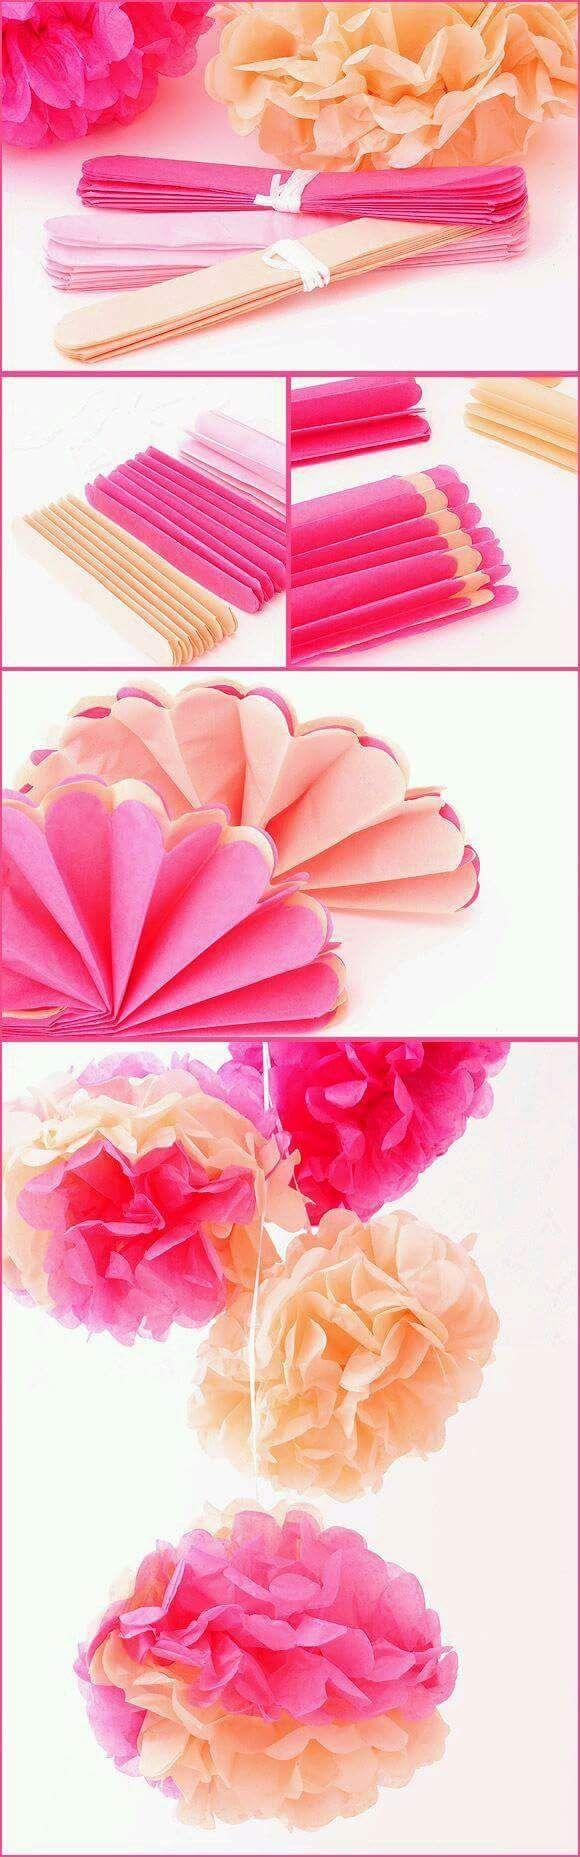 Ooh pretty flower